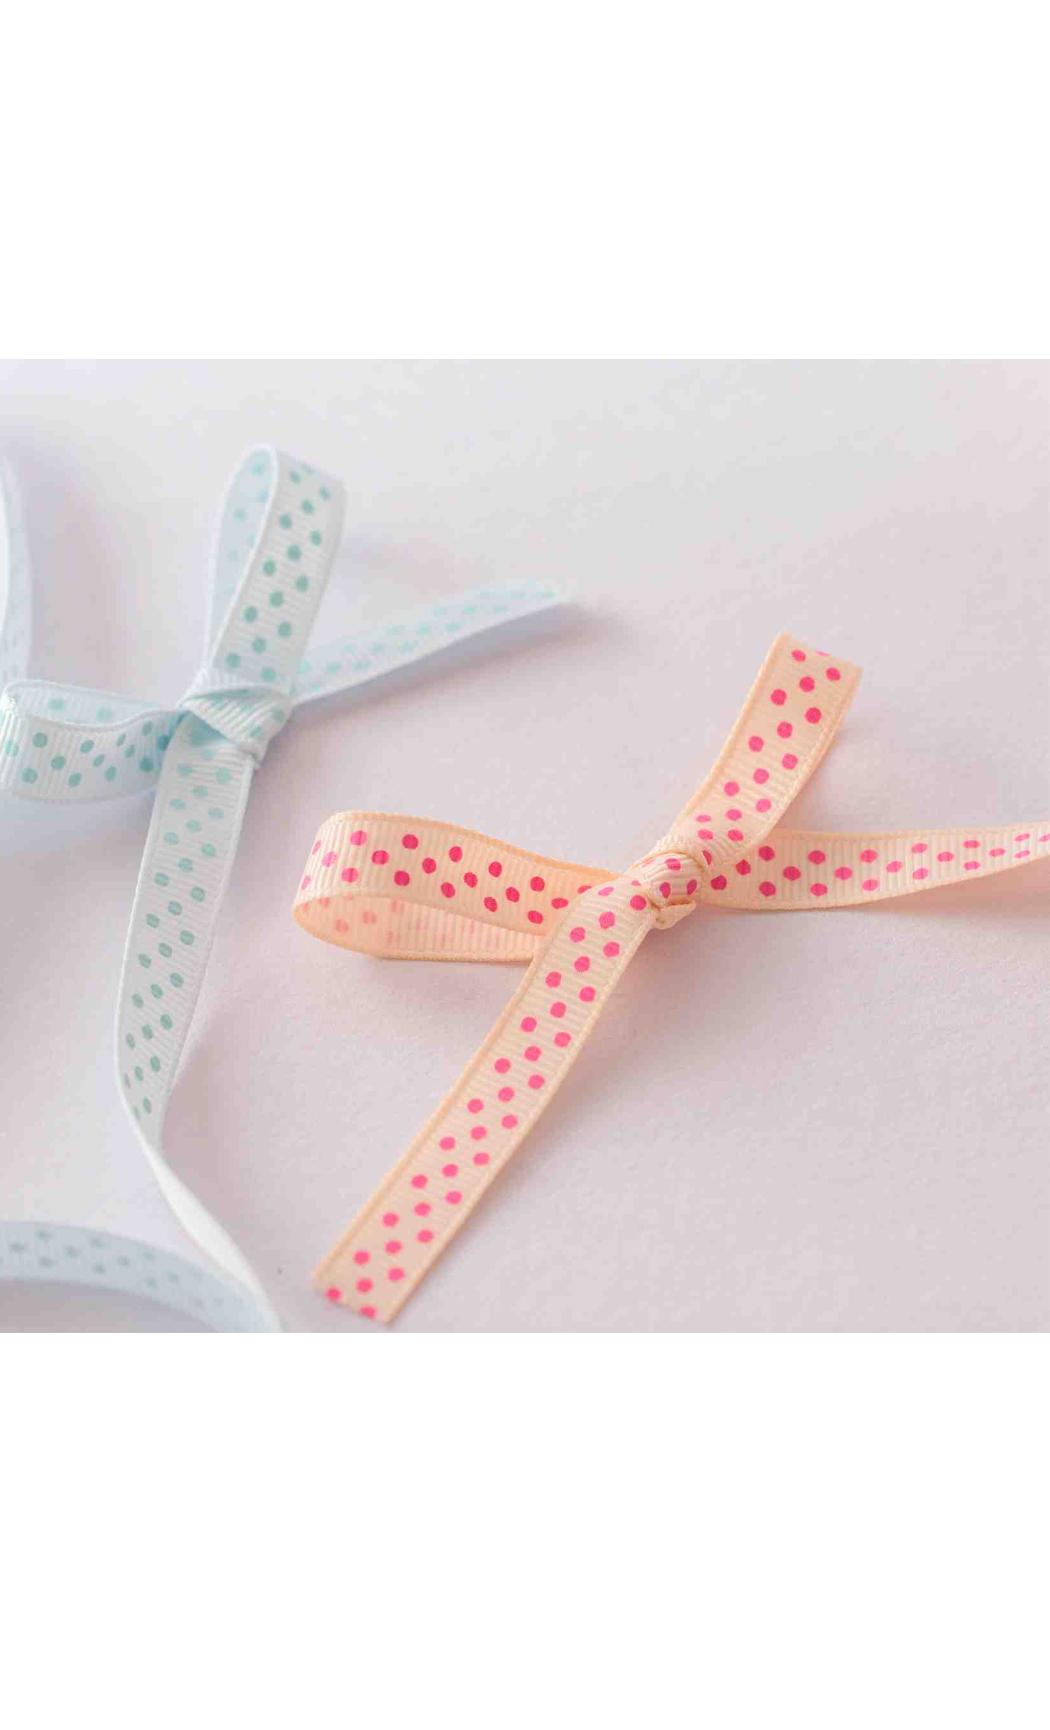 Light Blue Ribbon with Sky Blue Polka Dots - Buy Online